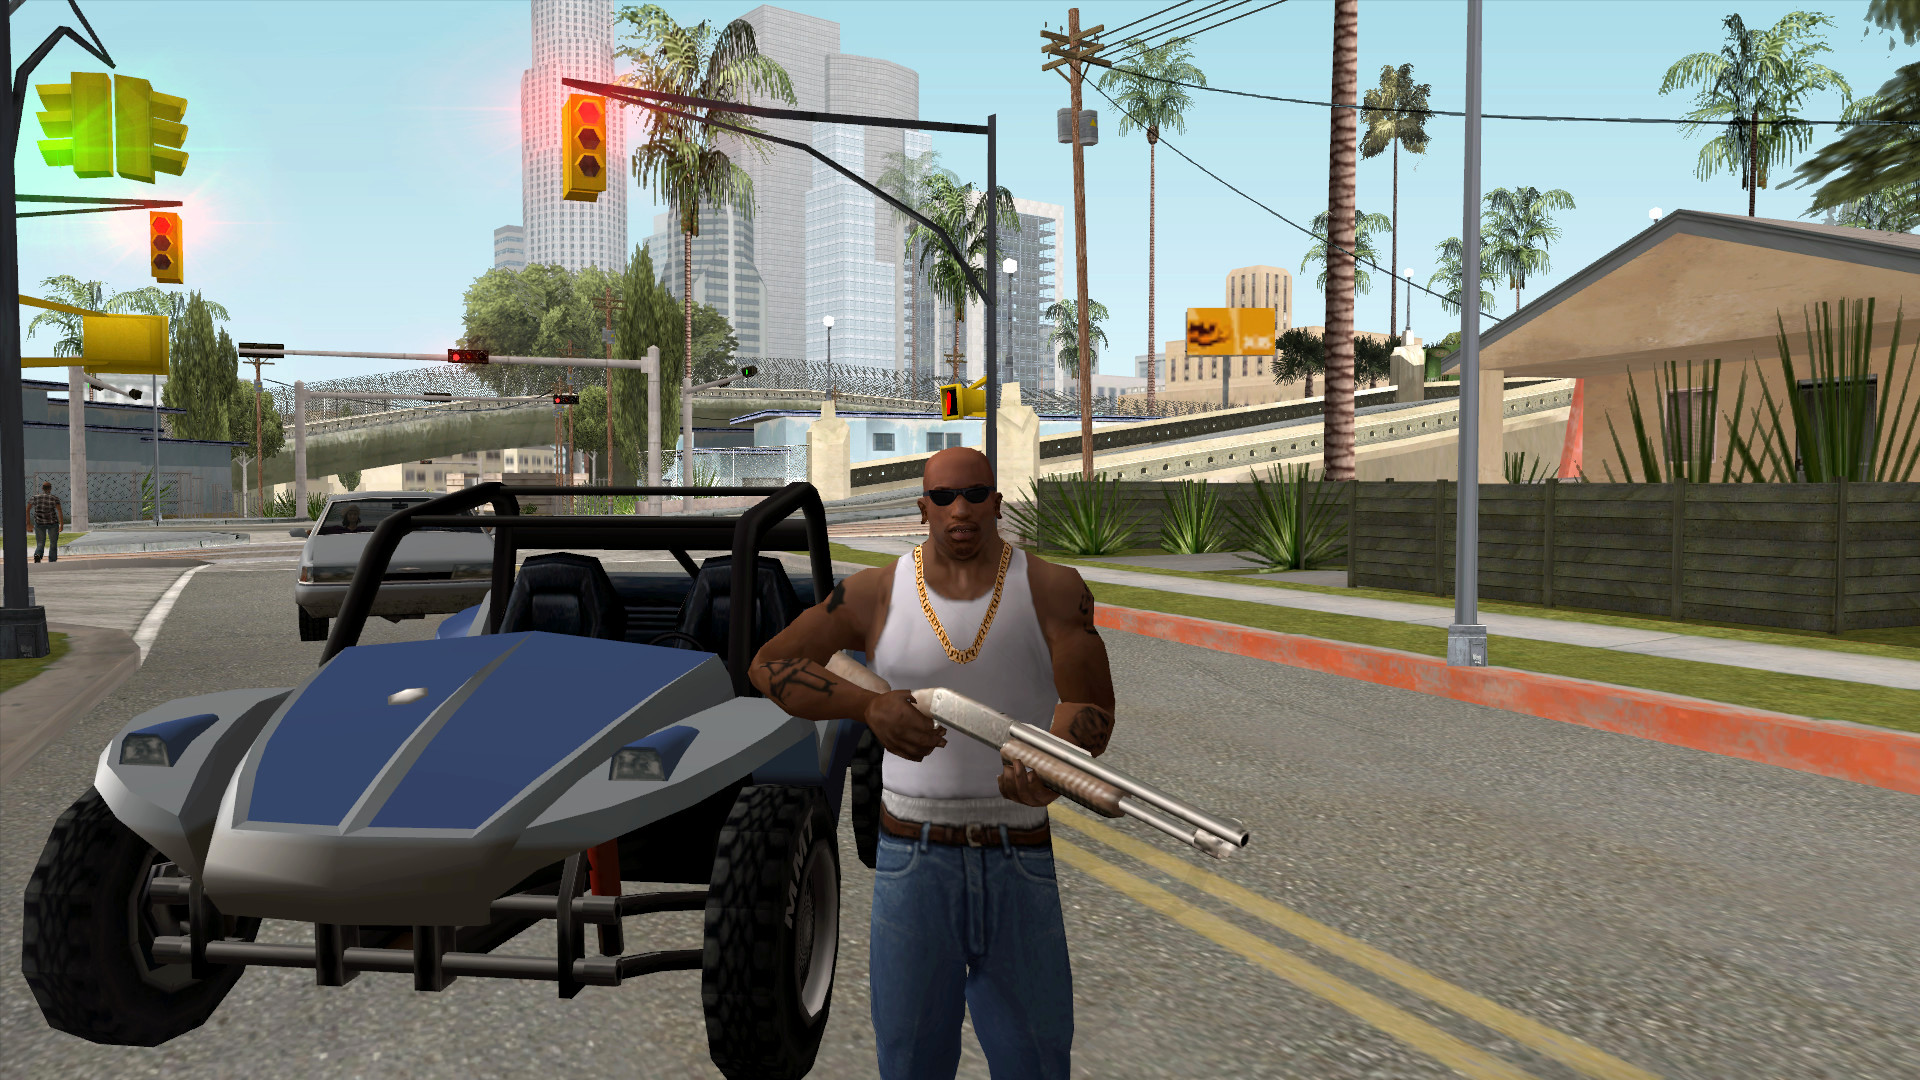 gta_sa 2016-05-09 17-59-13-21.jpg - Grand Theft Auto: San Andreas